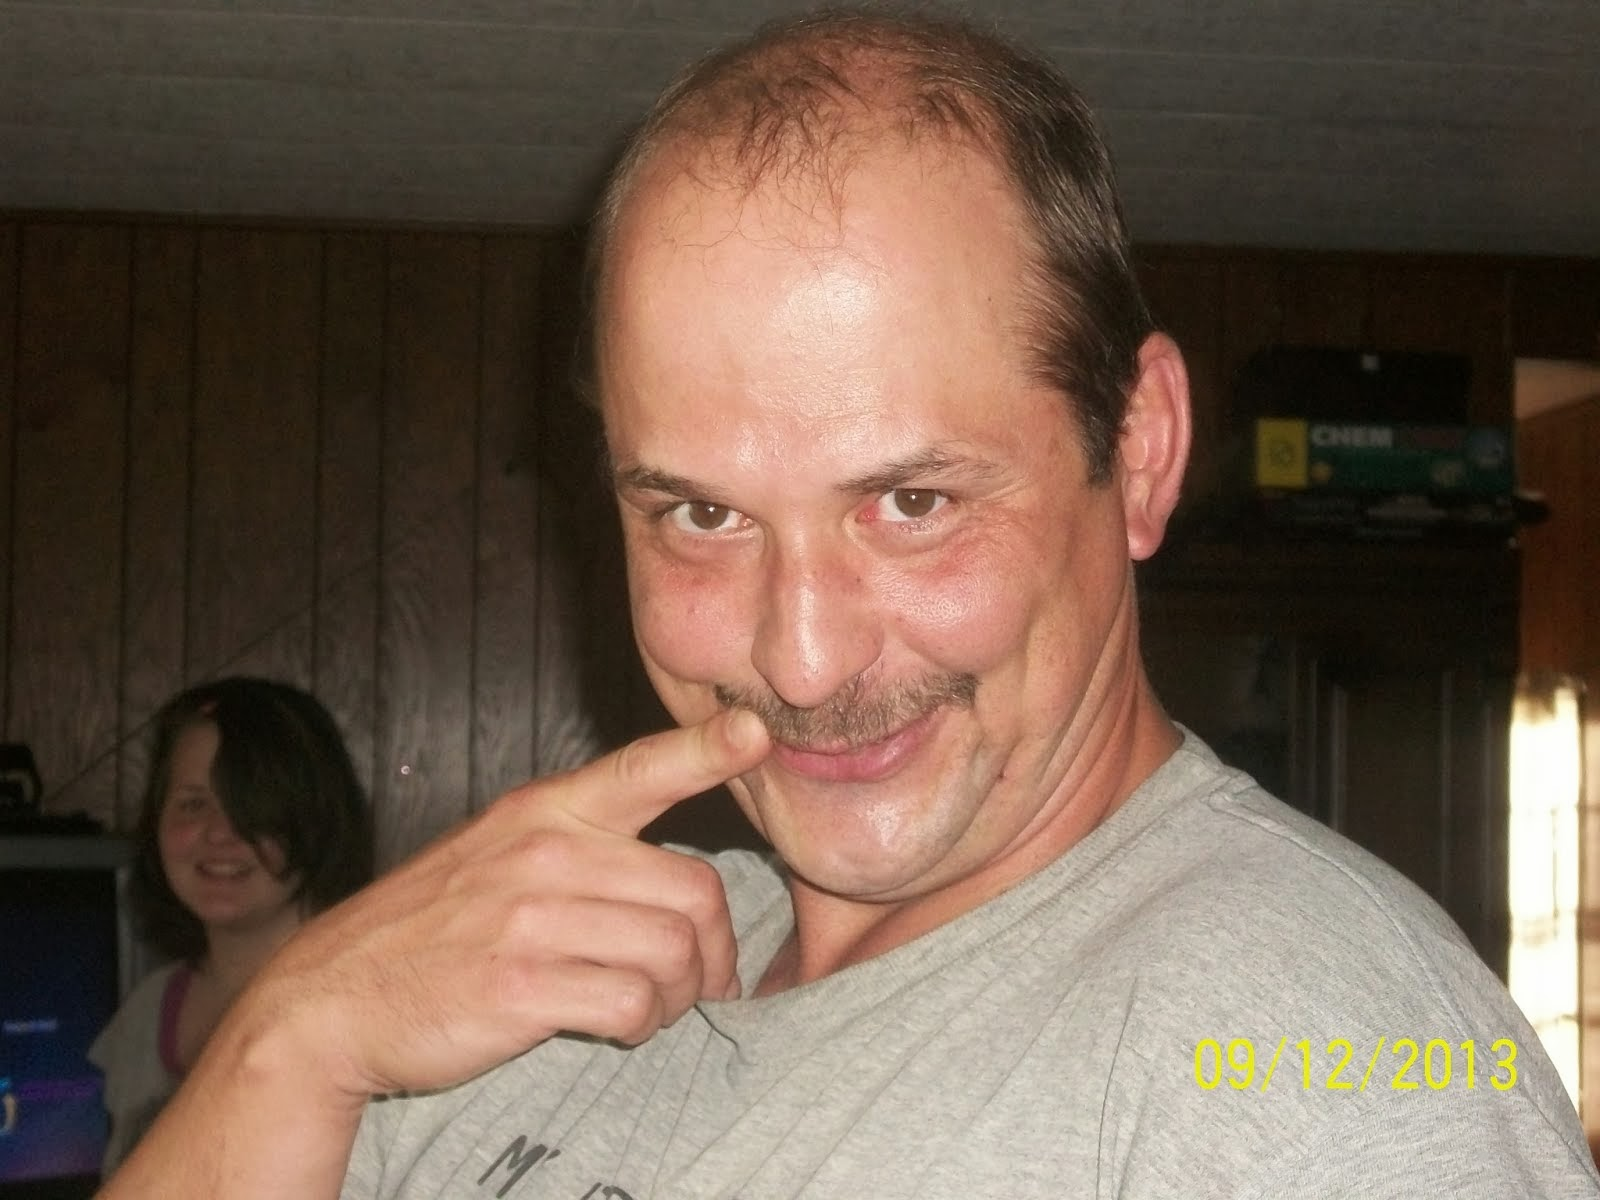 Wayne Age 43 AKA HUBBY